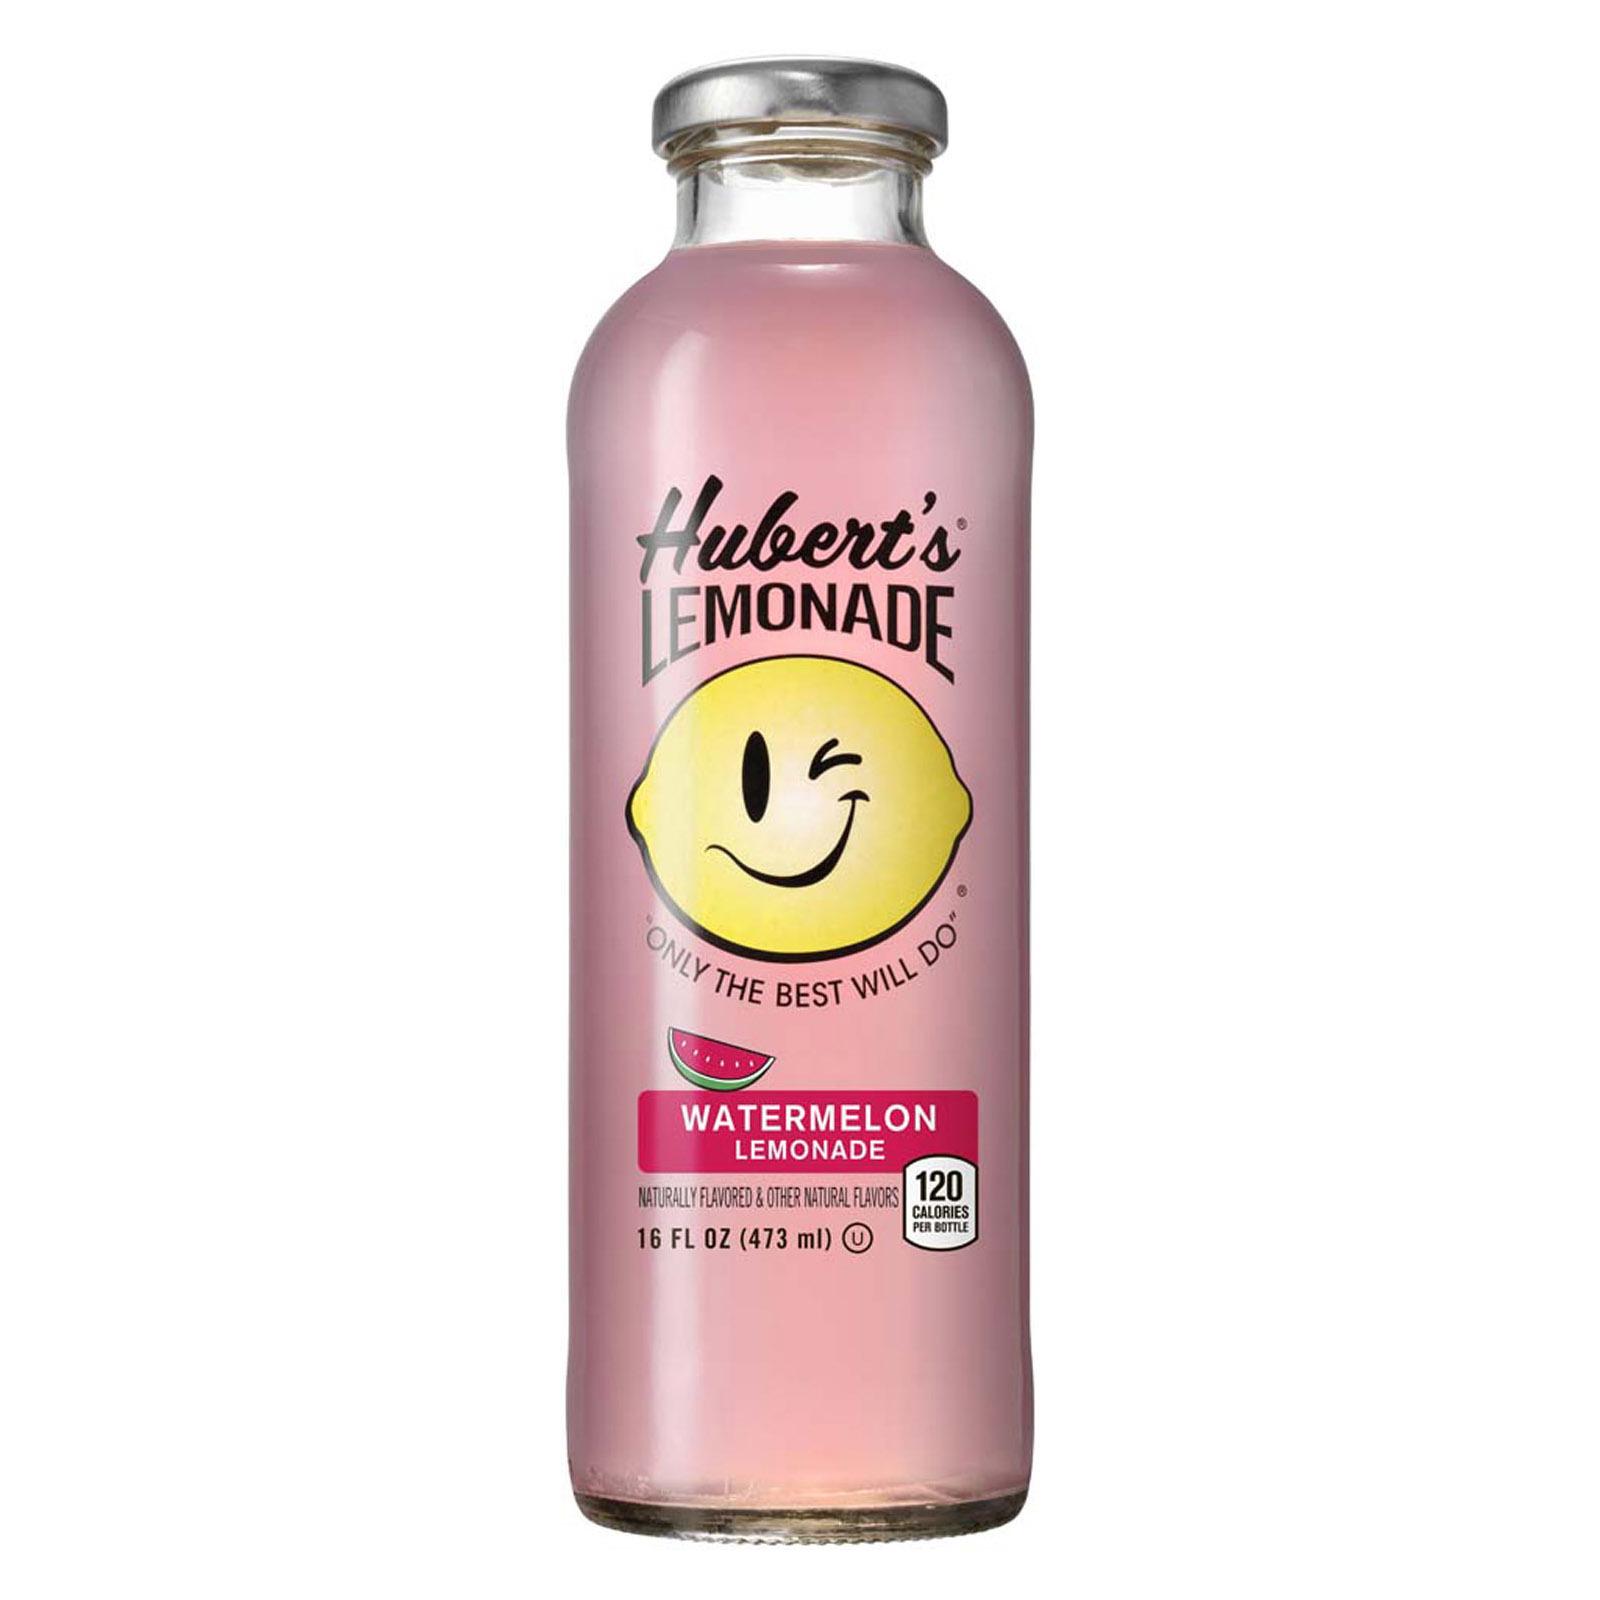 Hubert's Lemonade, Watermelon, 16 fl oz